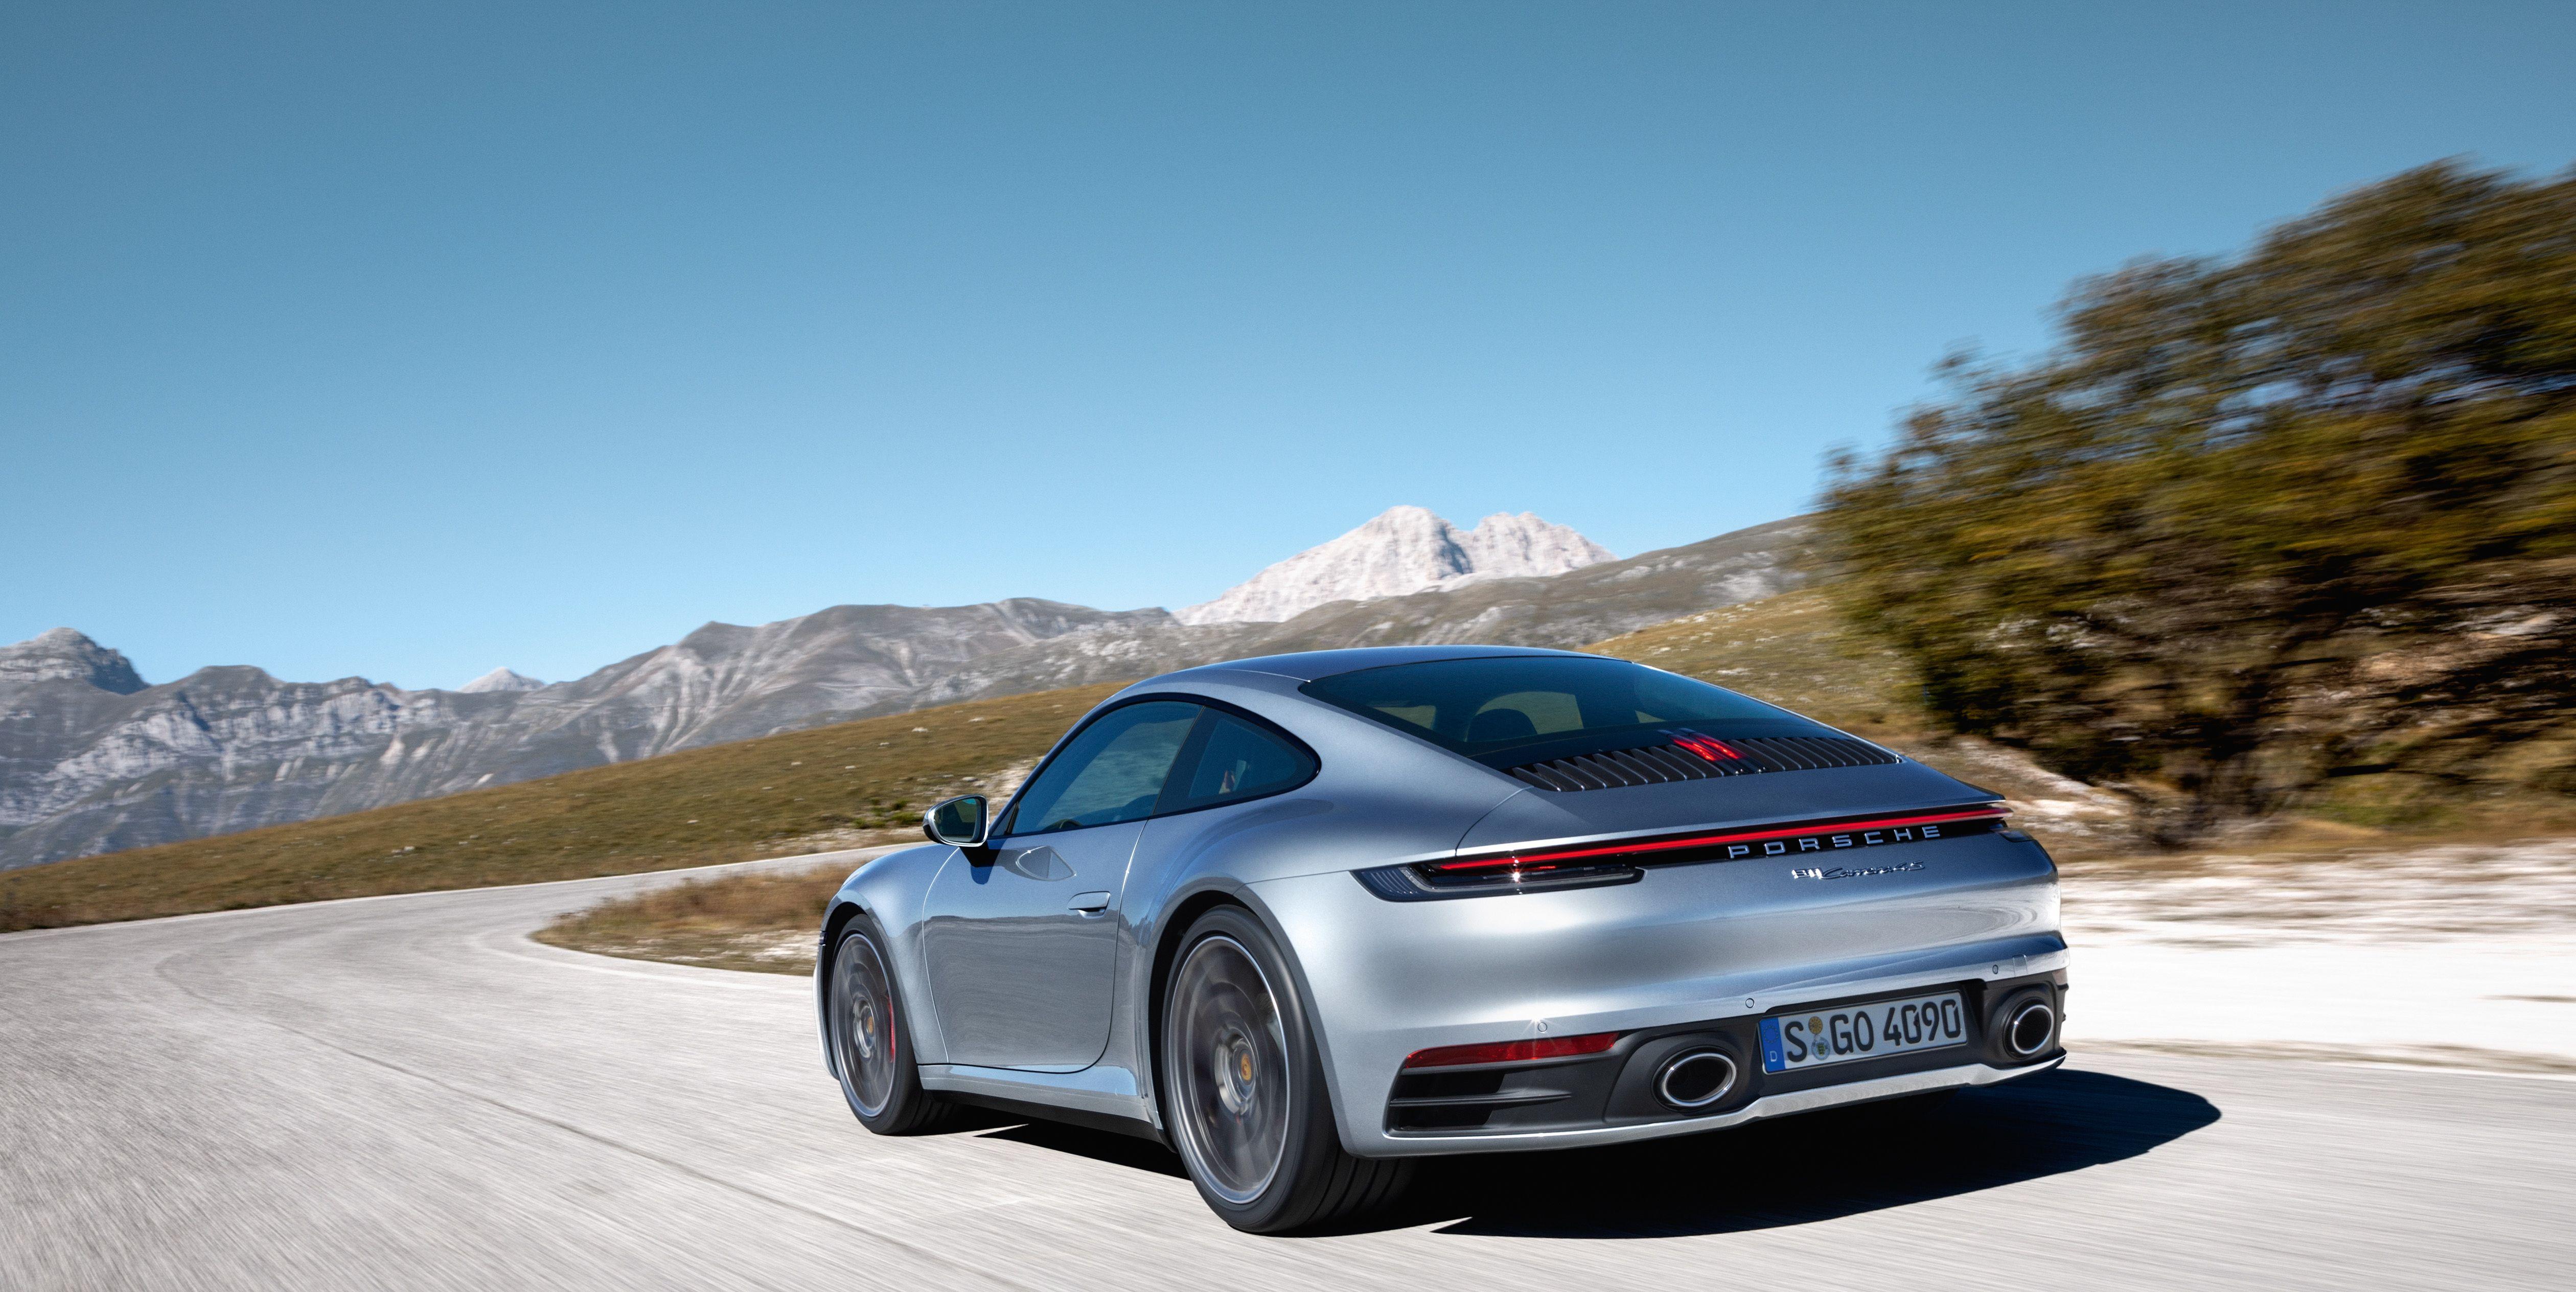 Build Porsche Engine Diagrams - Wiring Diagrams on